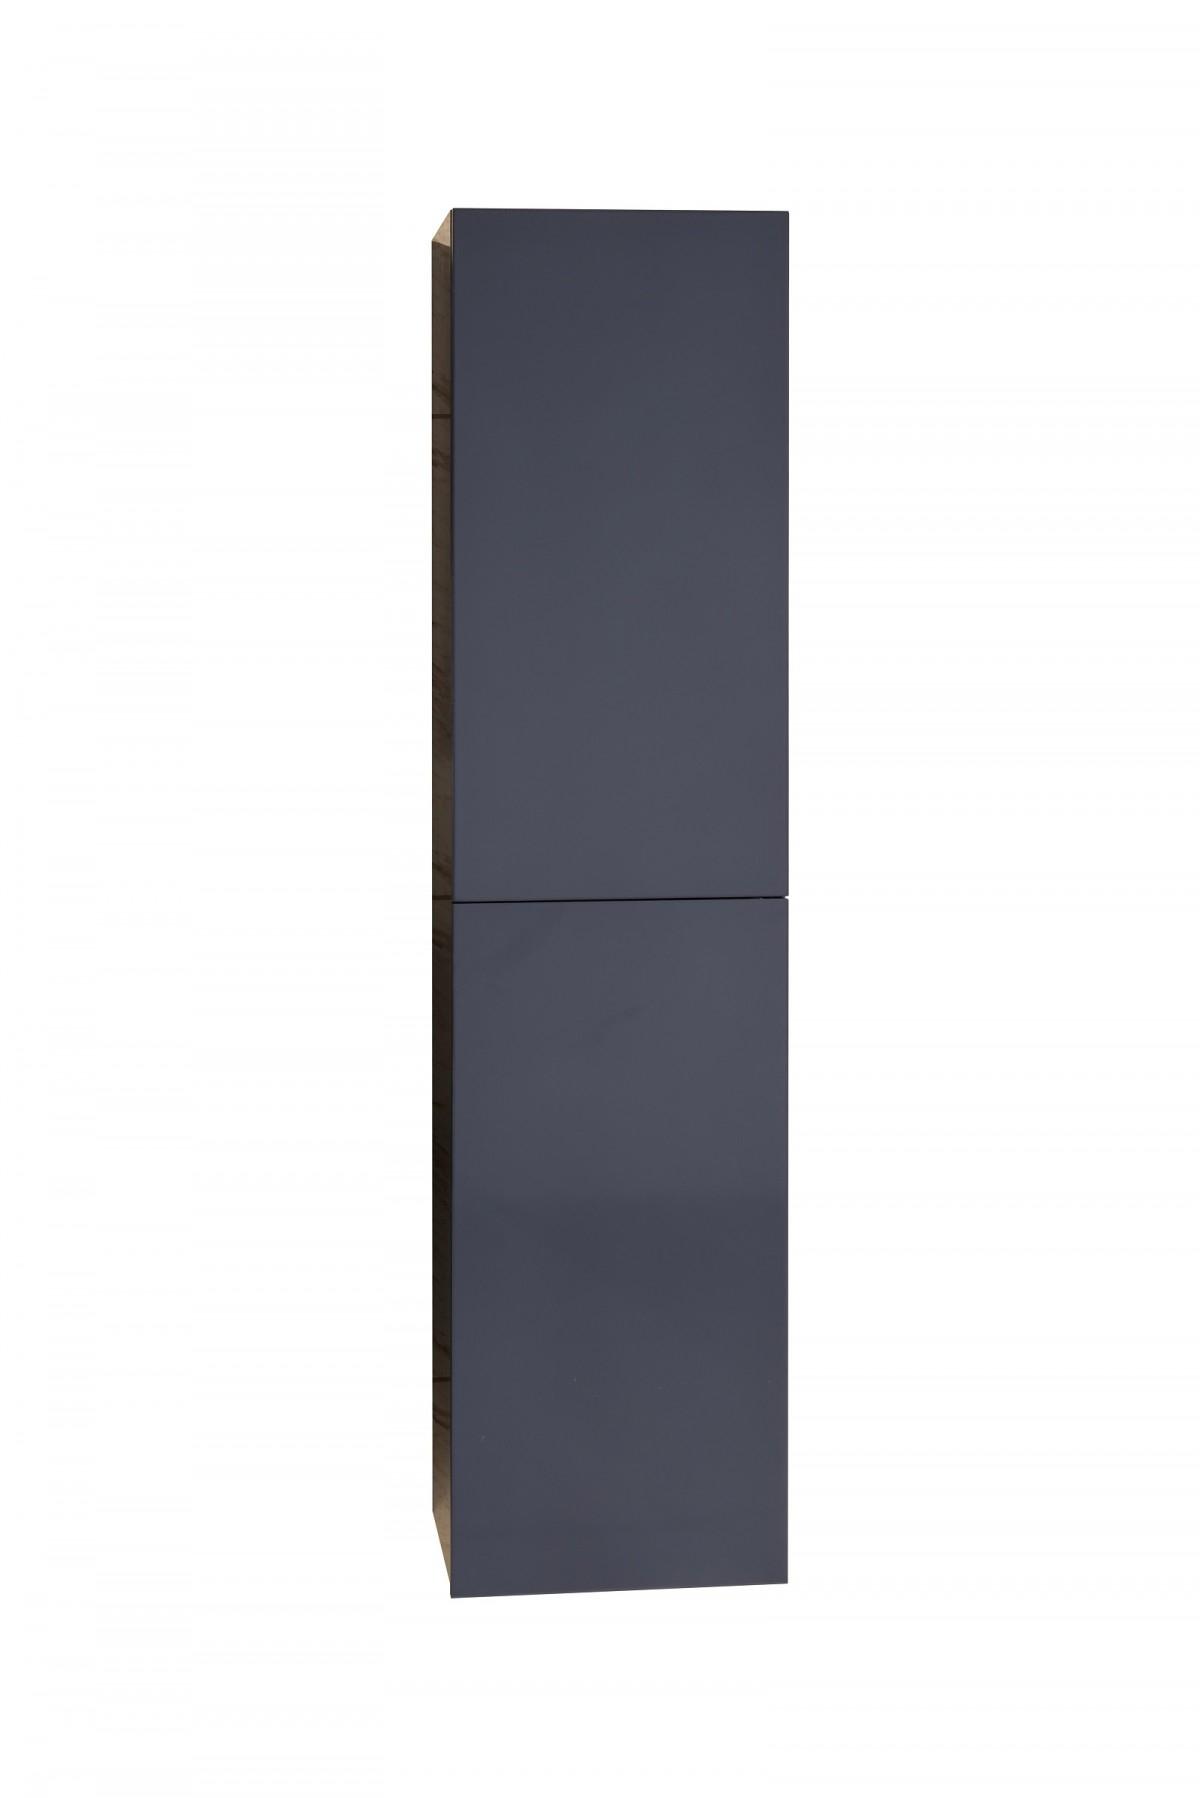 SaniGoods Giant kolomkast 120x35cm antraciet